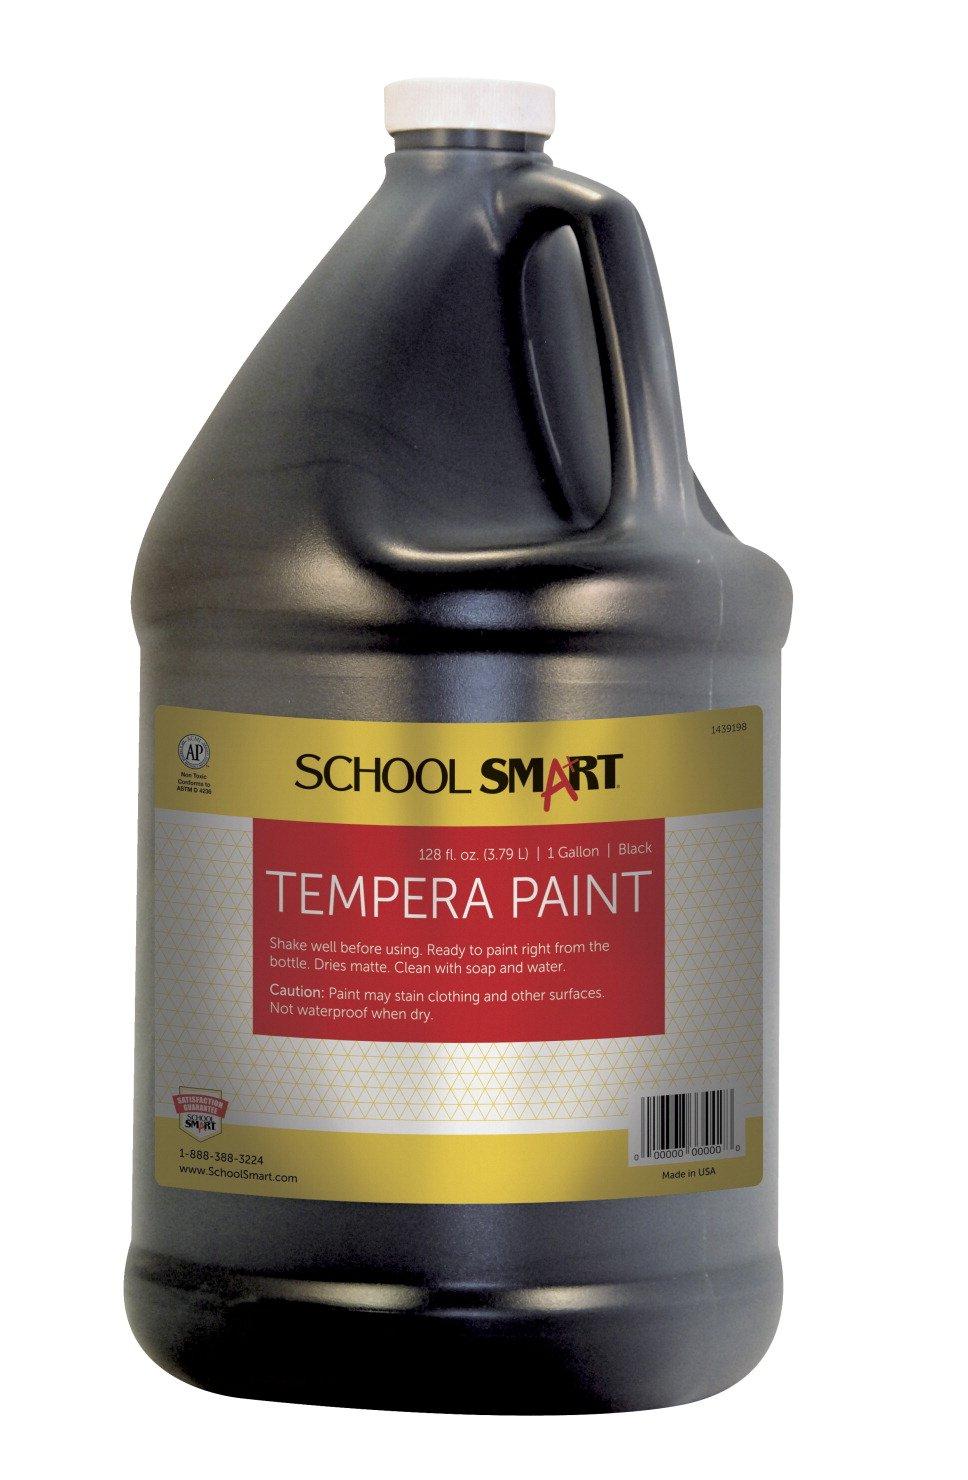 School Smart Tempera Paint - Gallon - Black